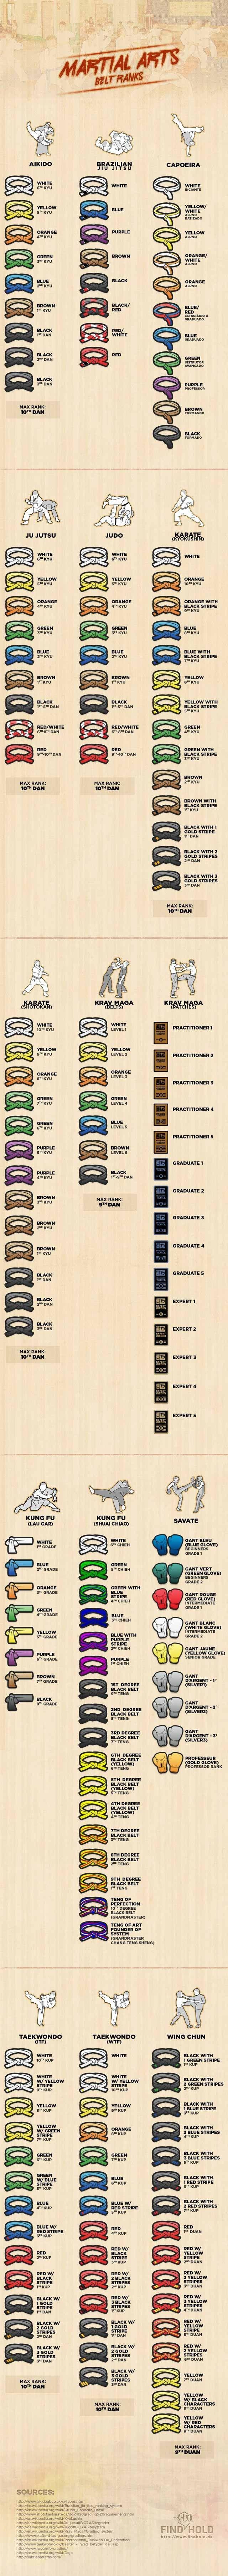 15 Martial Arts Belt Rankings Infographic. I don't know karate, I know Ka-RAZY!